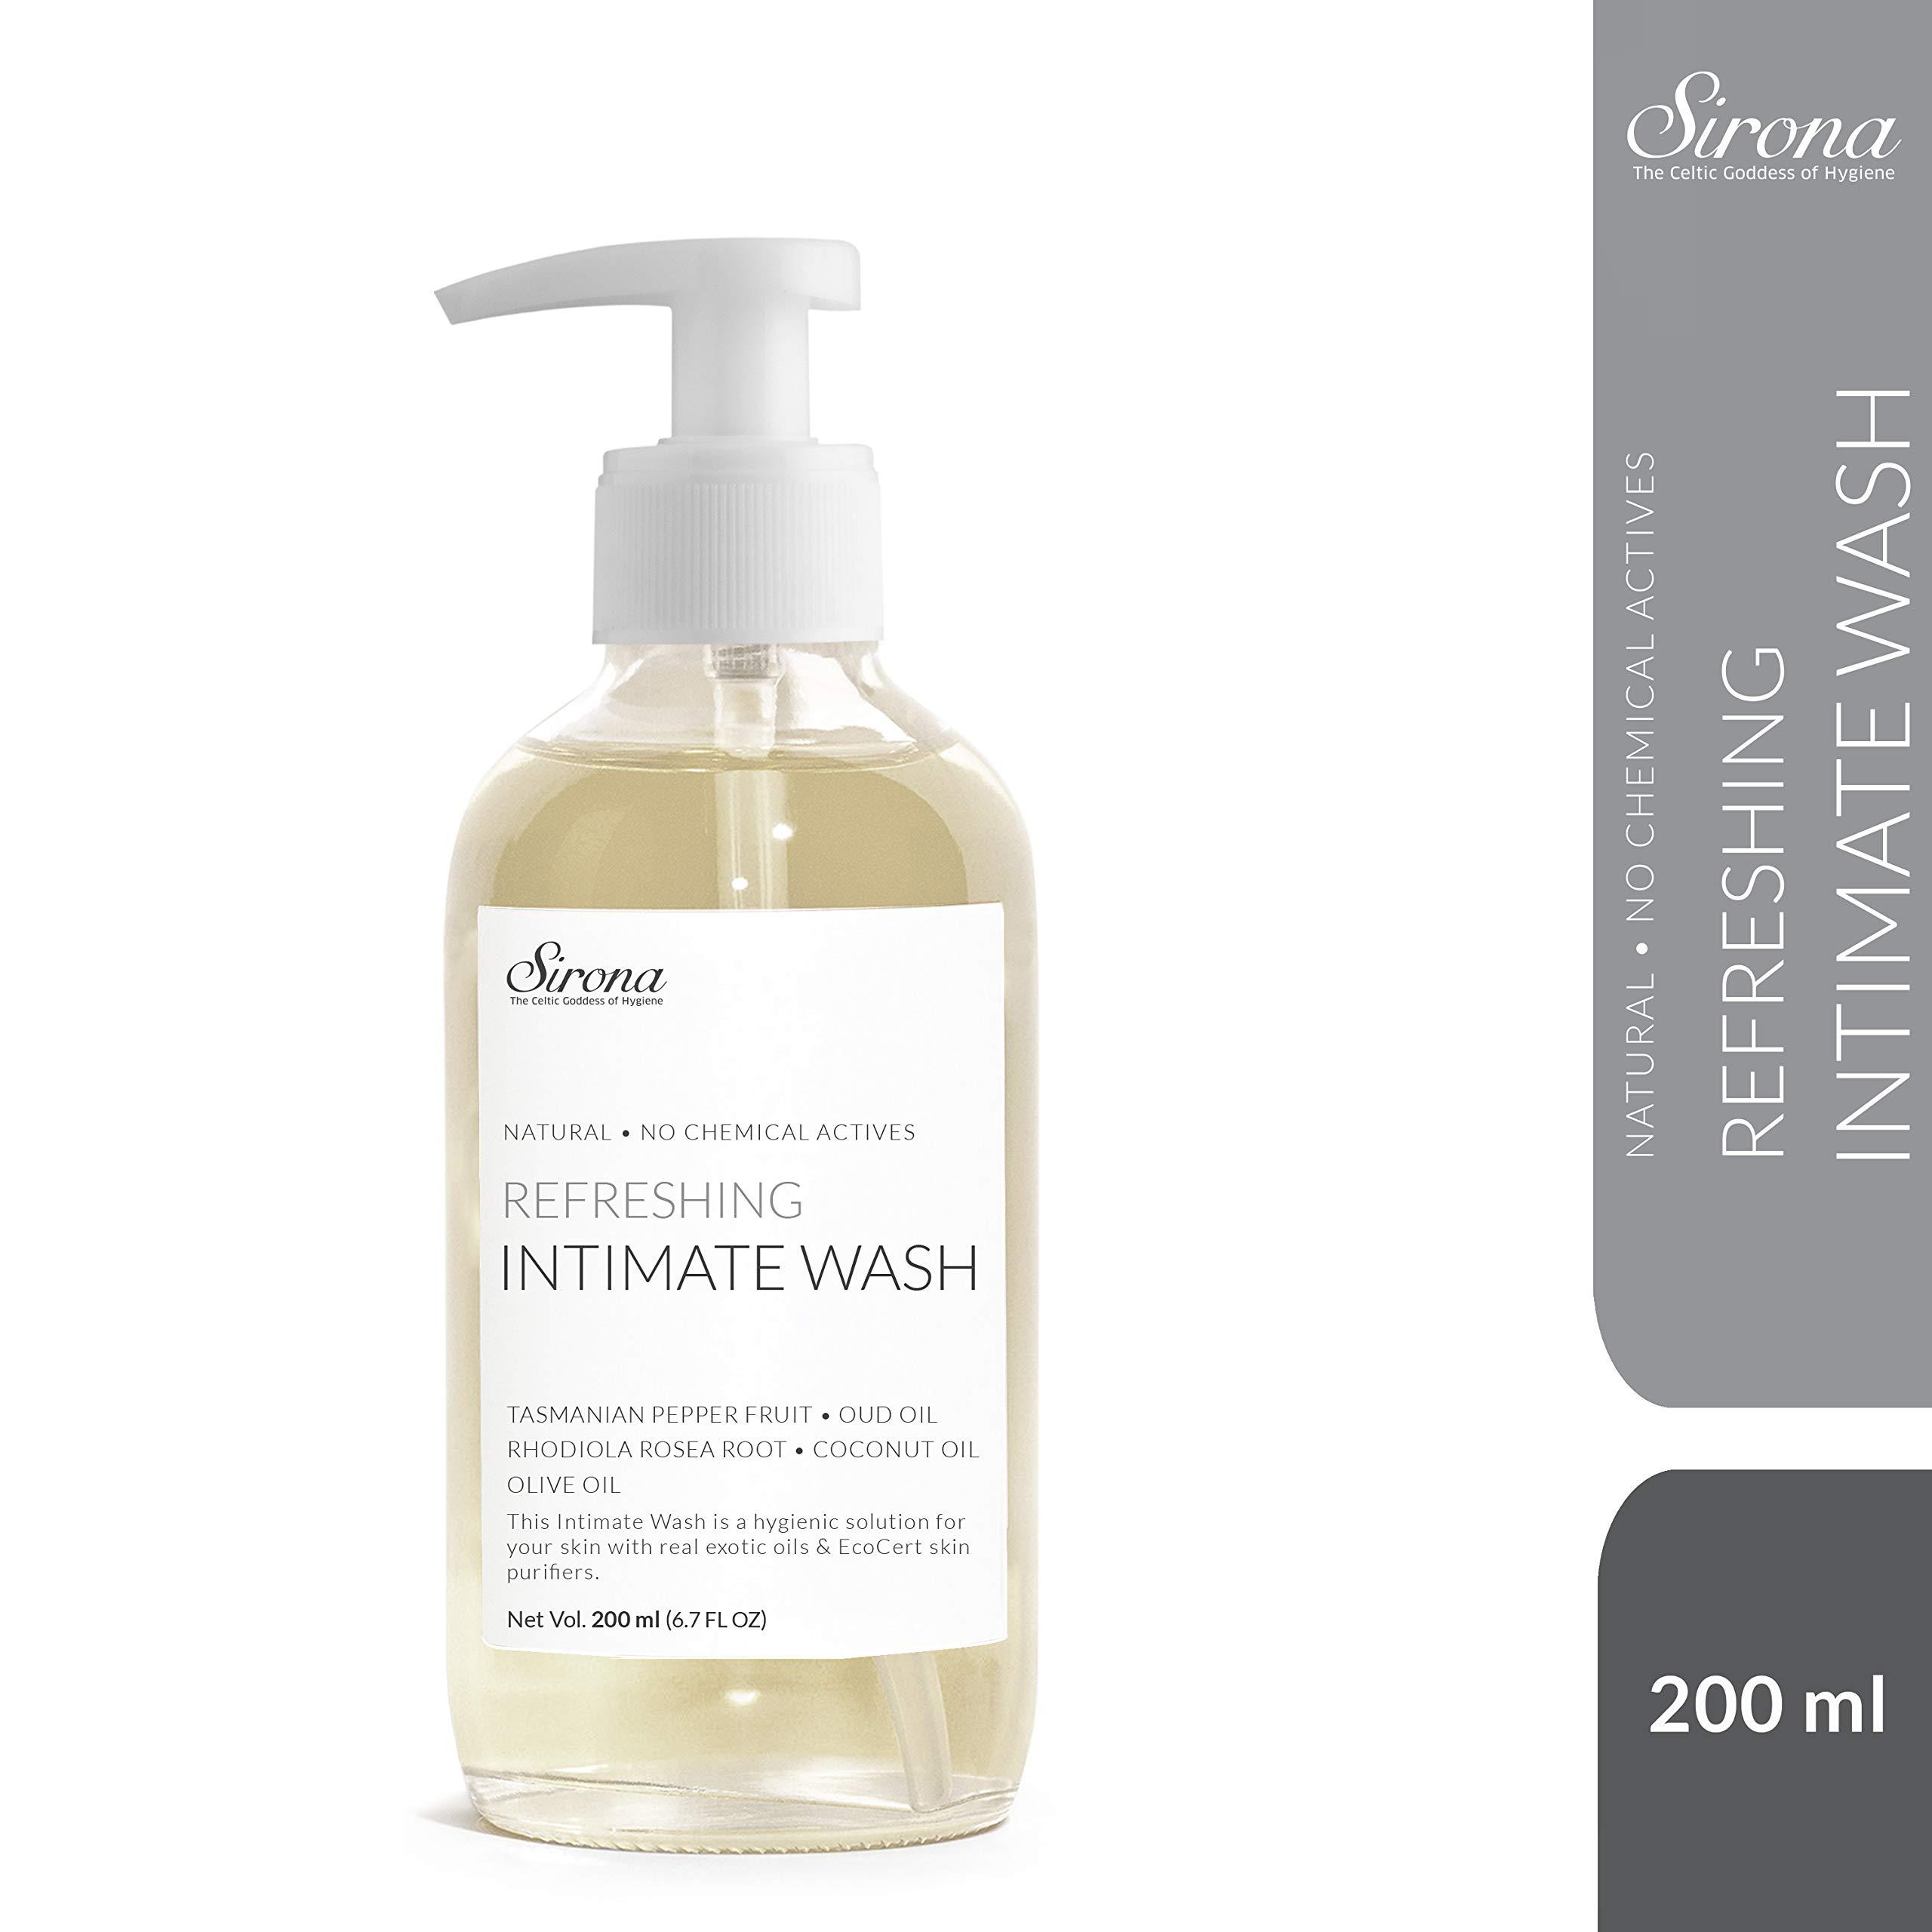 Sirona Natural Ph. Balanced Intimate Wash with 5 Magical Herbs and No Chemical Actives - 200 ml (White) product image